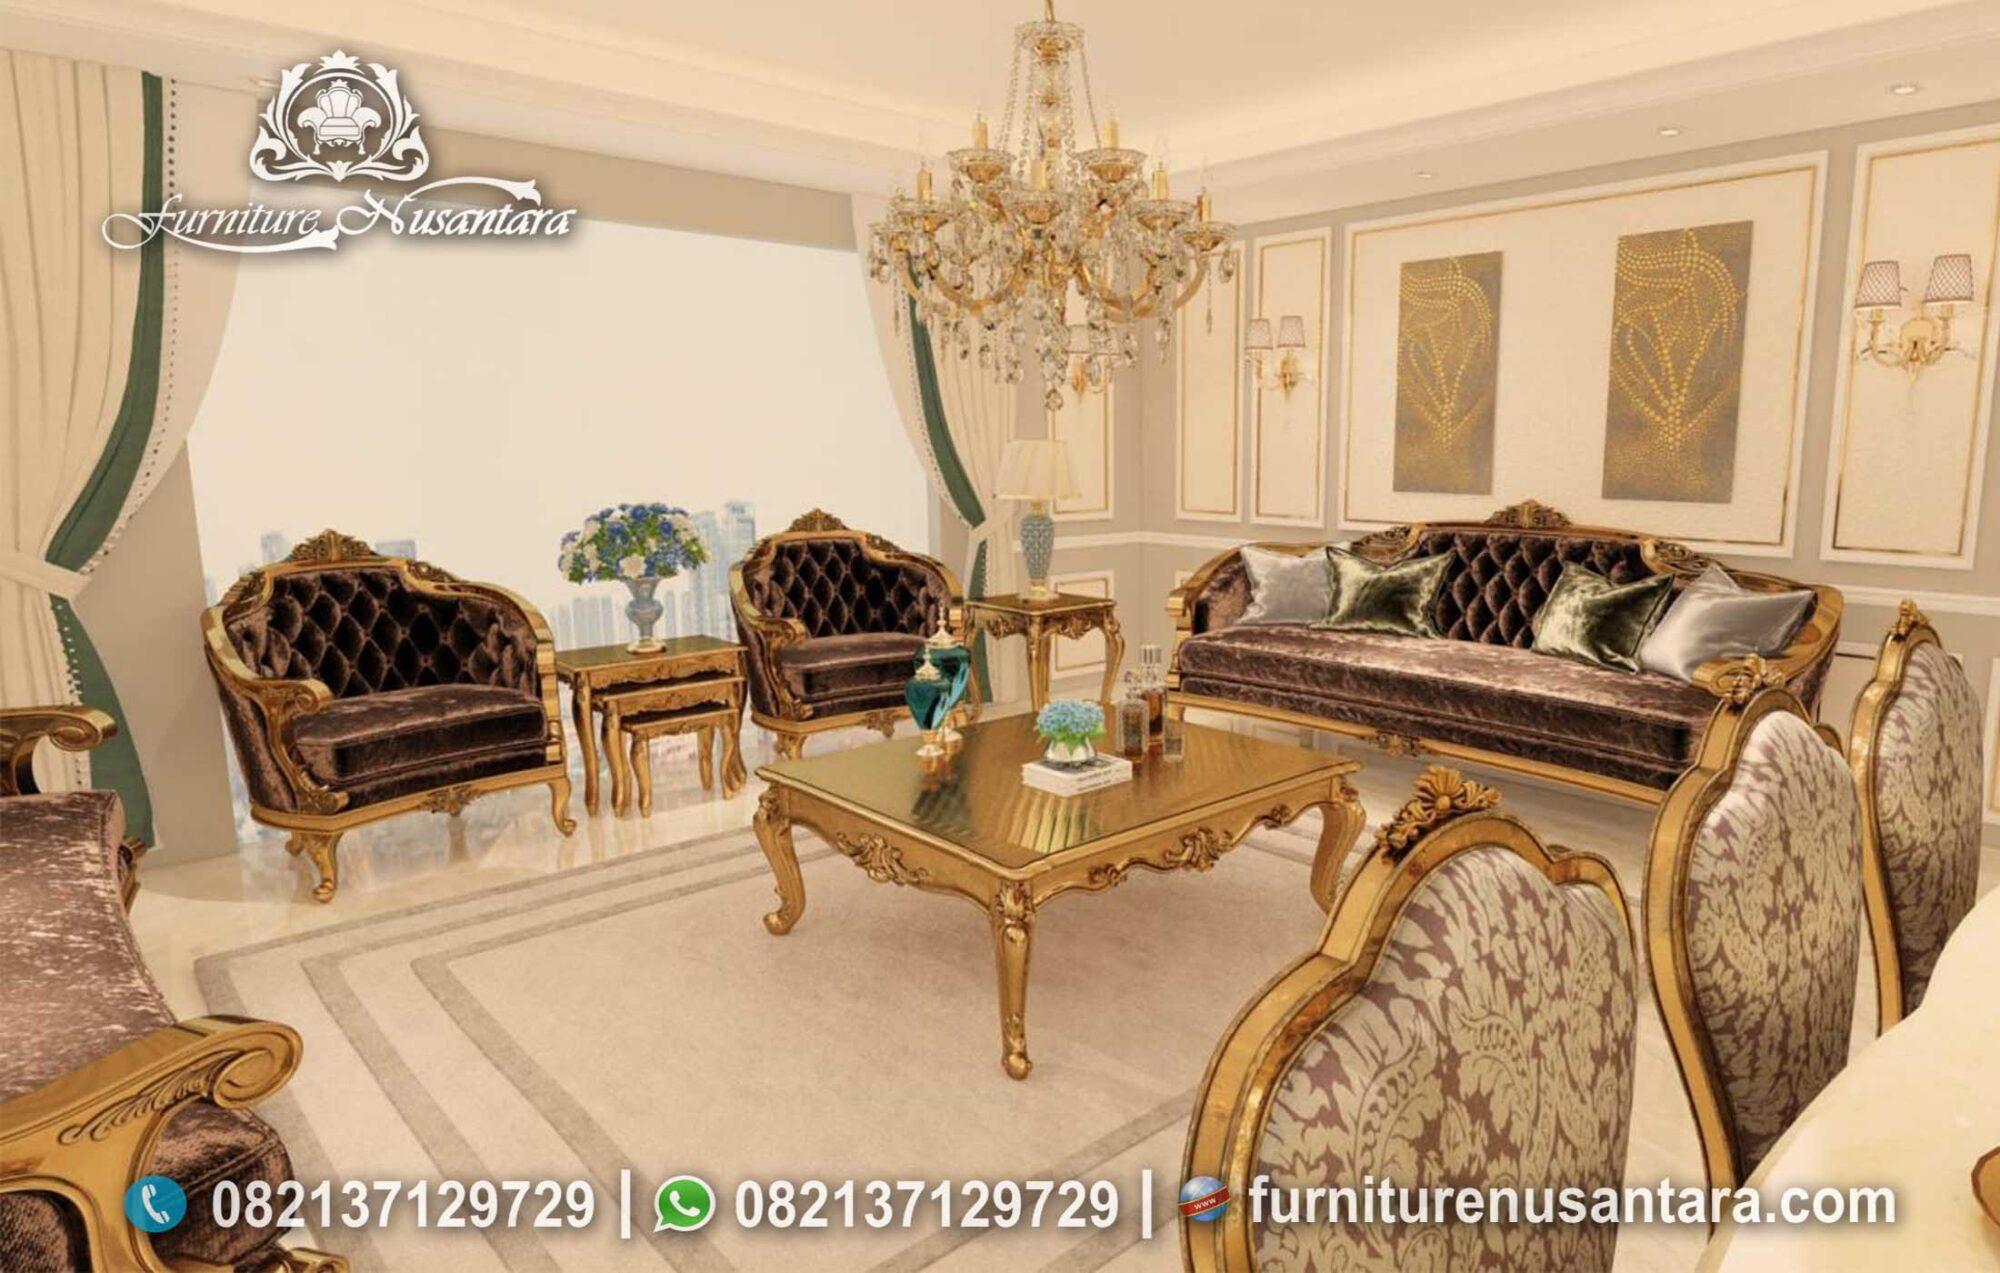 Sofa Ukir Jepara Mewah Warna Gold ST-14, Furniture Nusantara